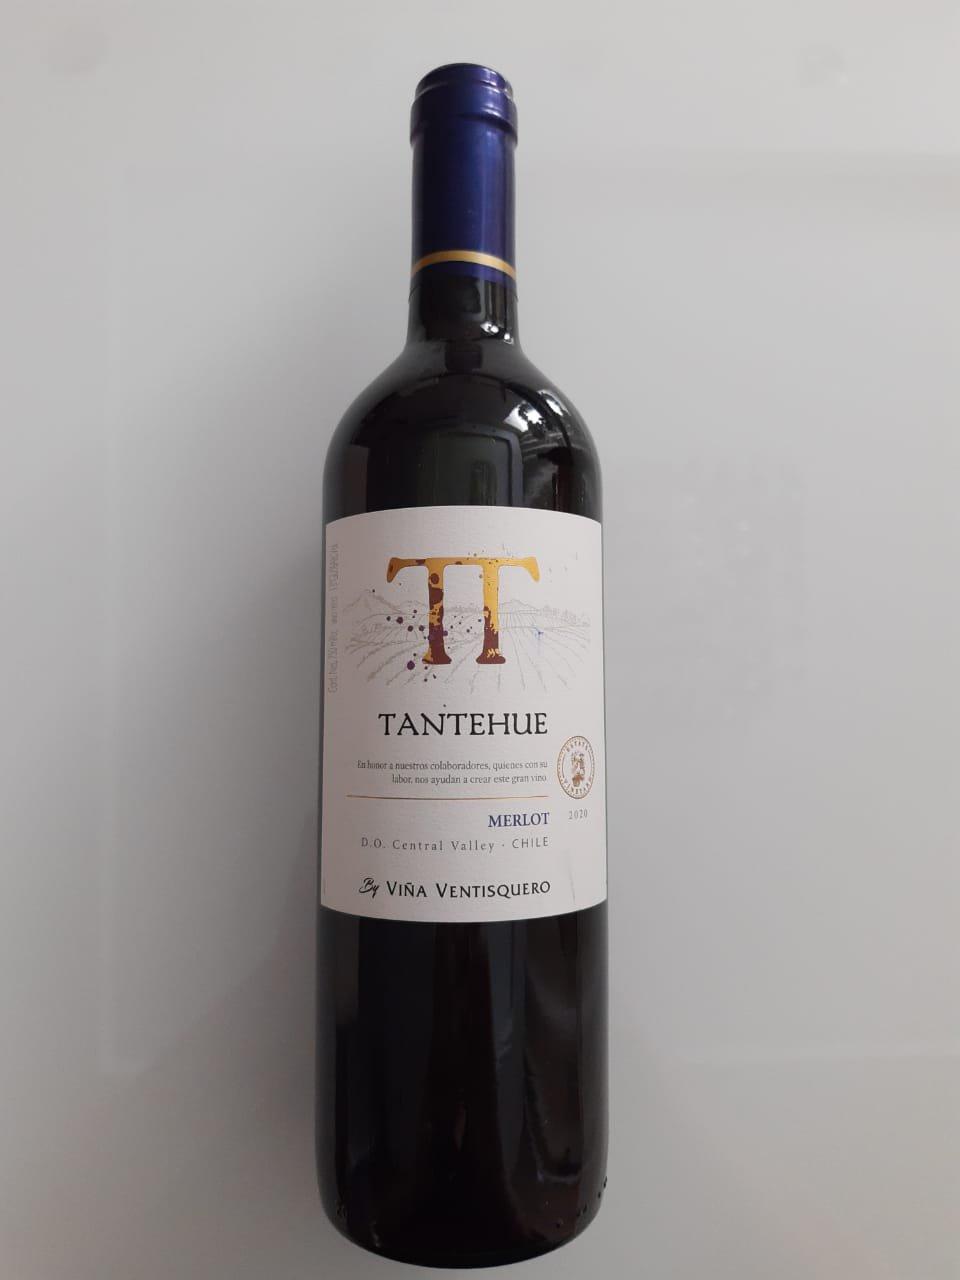 Vinho Ventisquero Tantehue Merlot 750ml